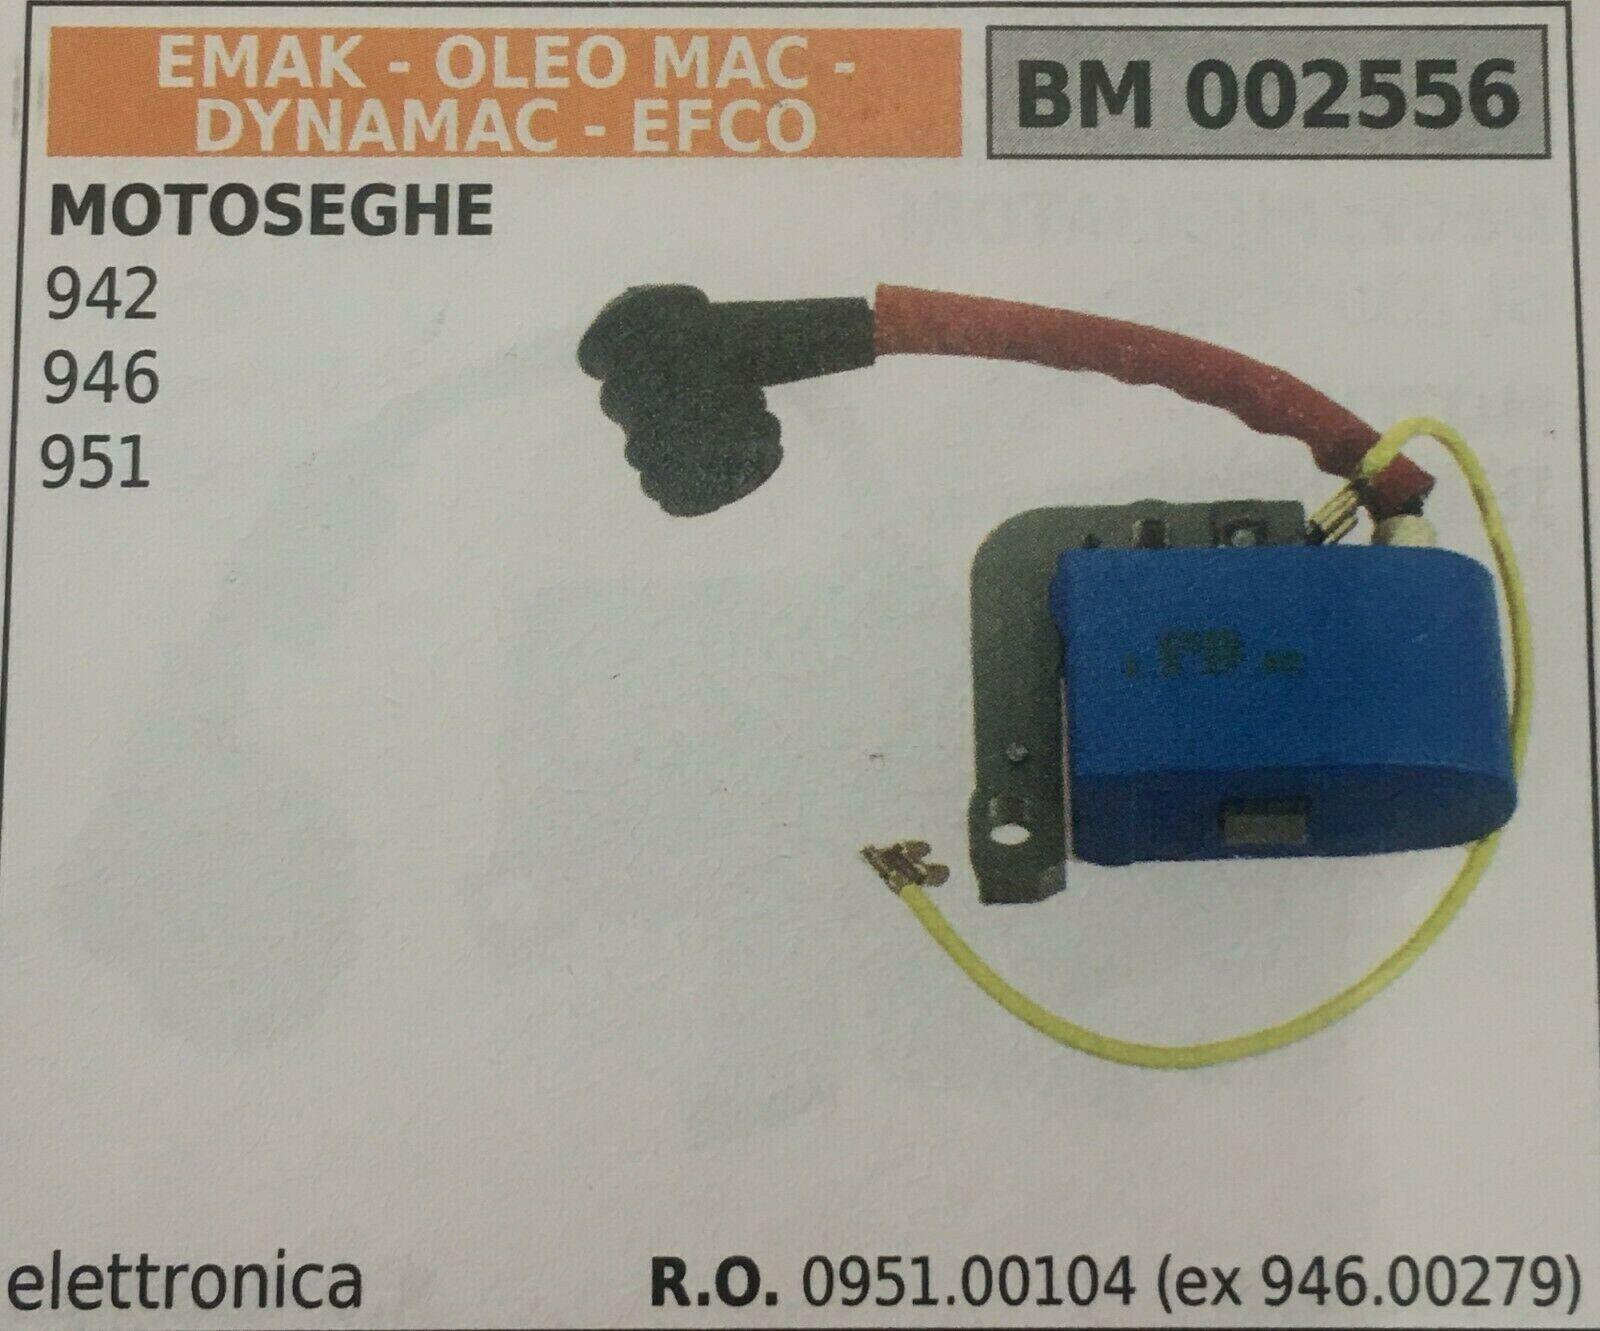 Bobina Electrónica Emak Oleo Mac -Dynamac- Efco Bm 002556